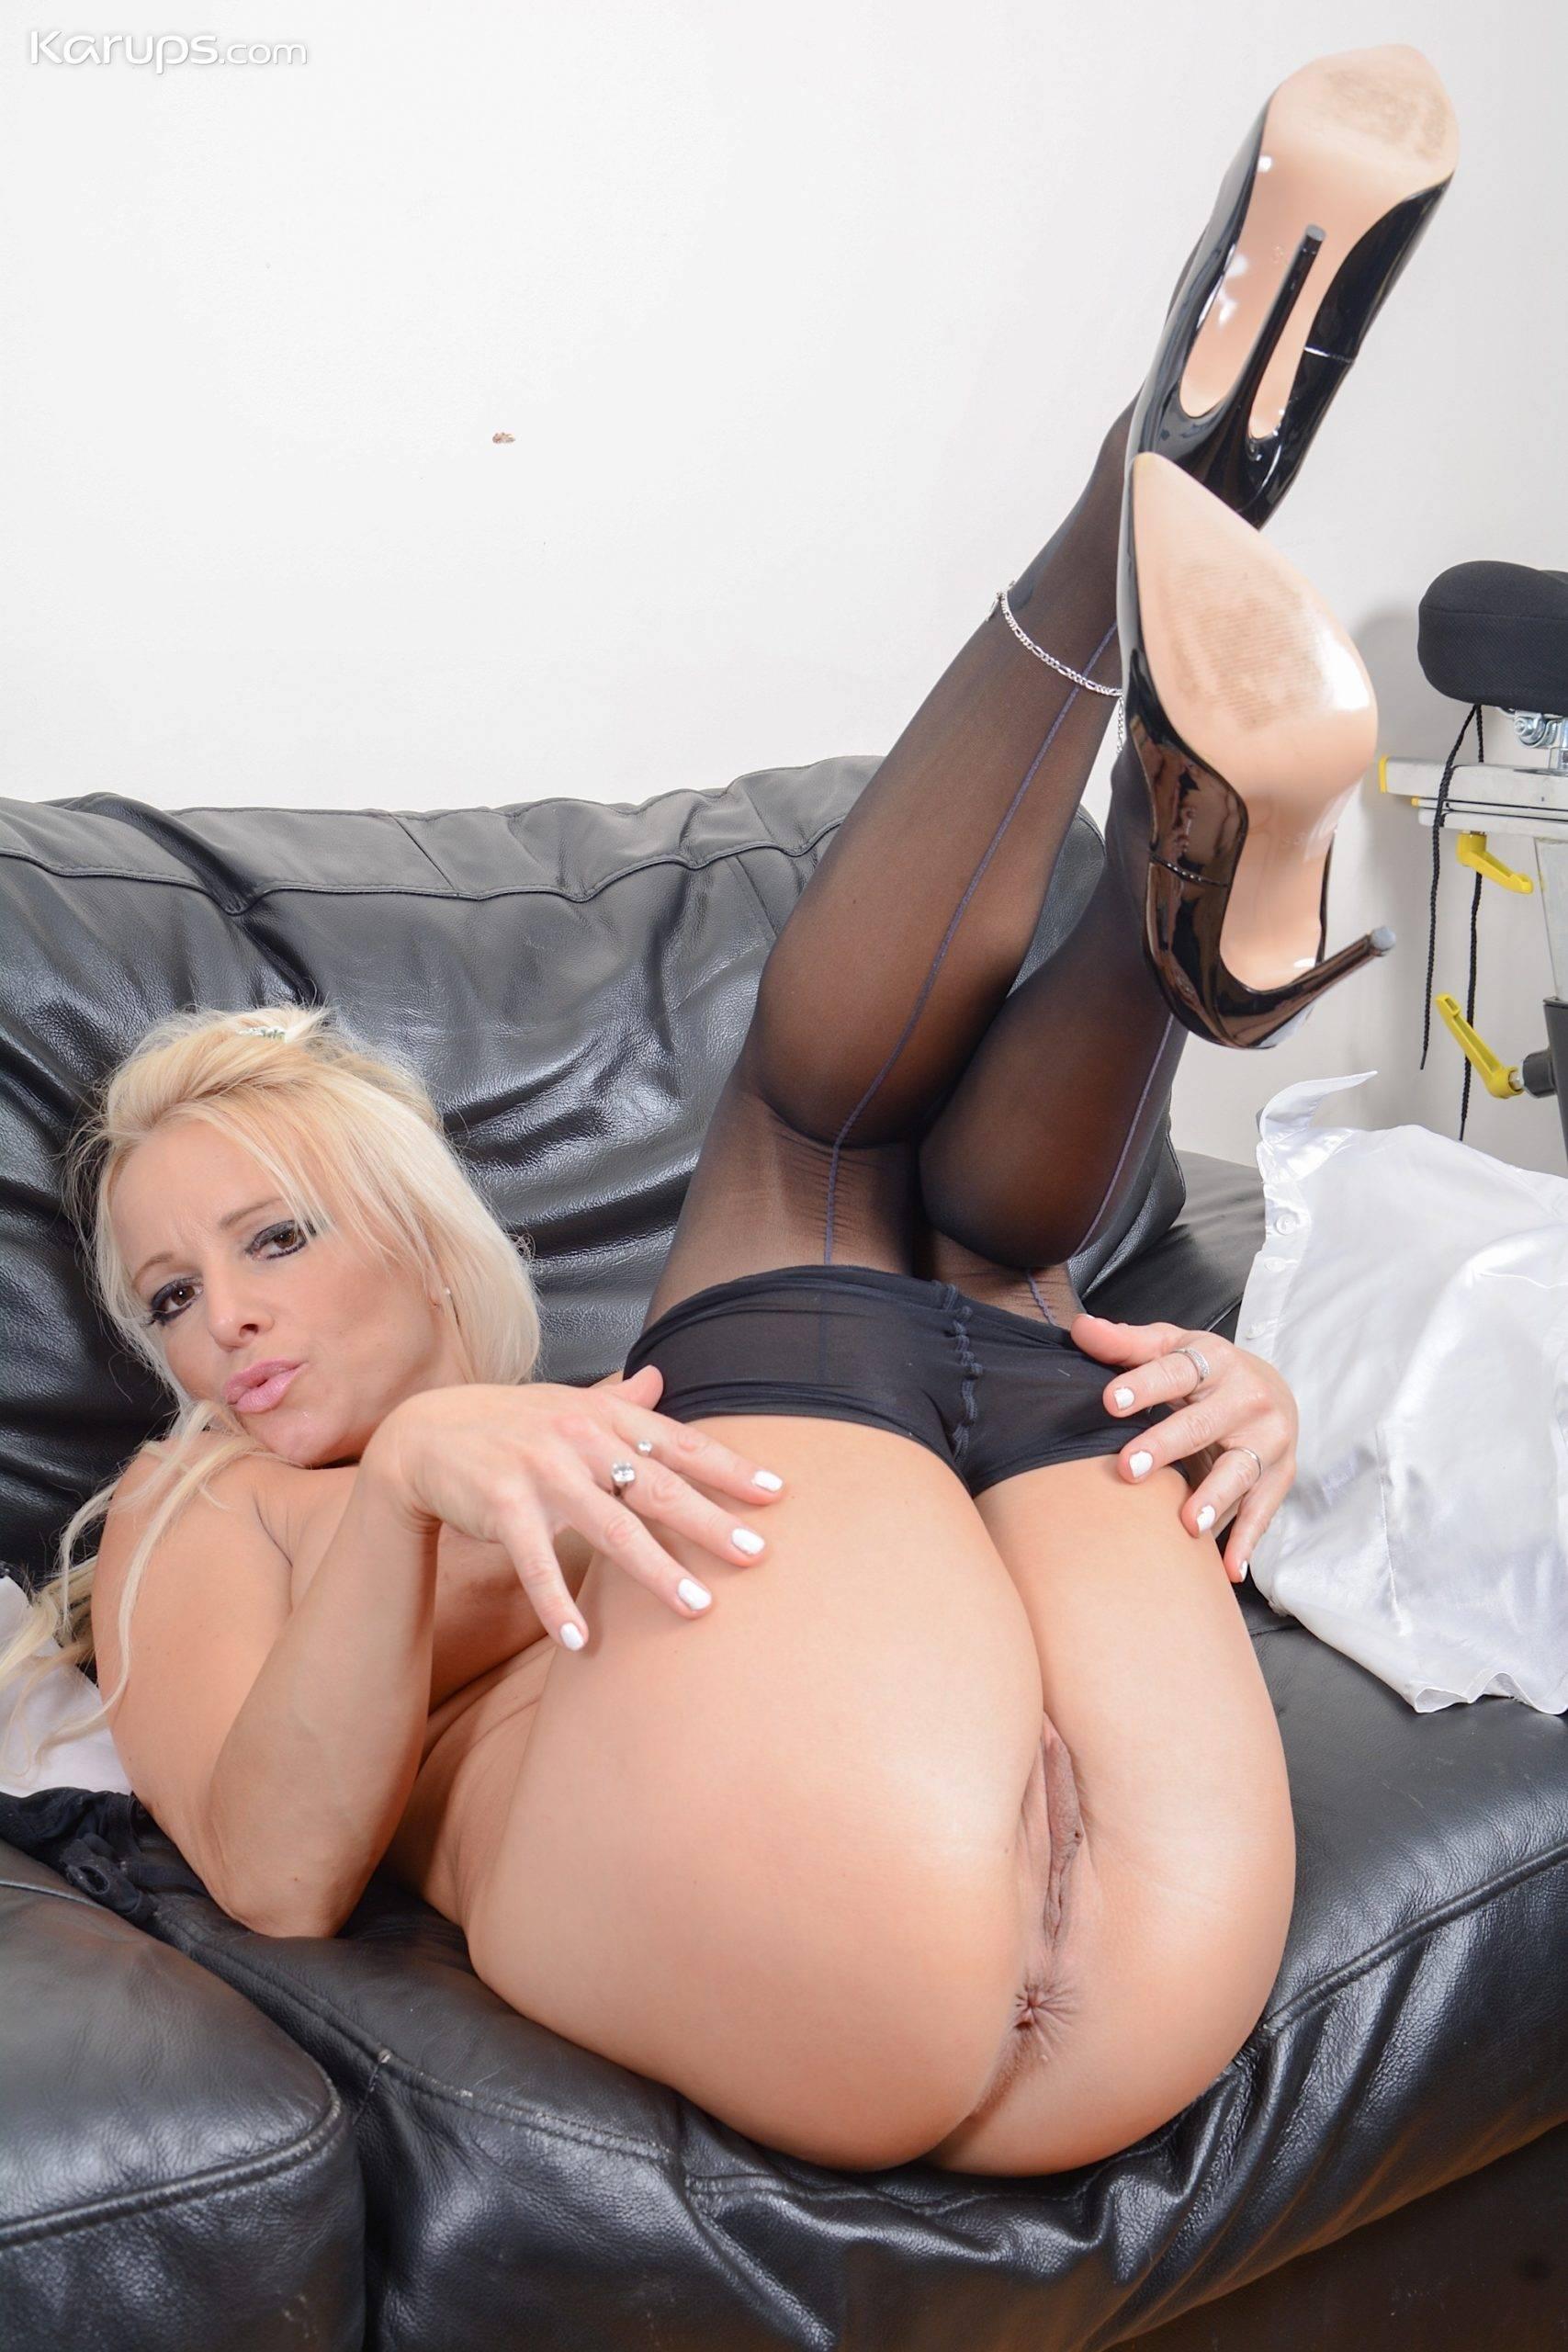 Older babe Tara Spades pulls down pantyhose and rubs her mature pussy at Karupsow